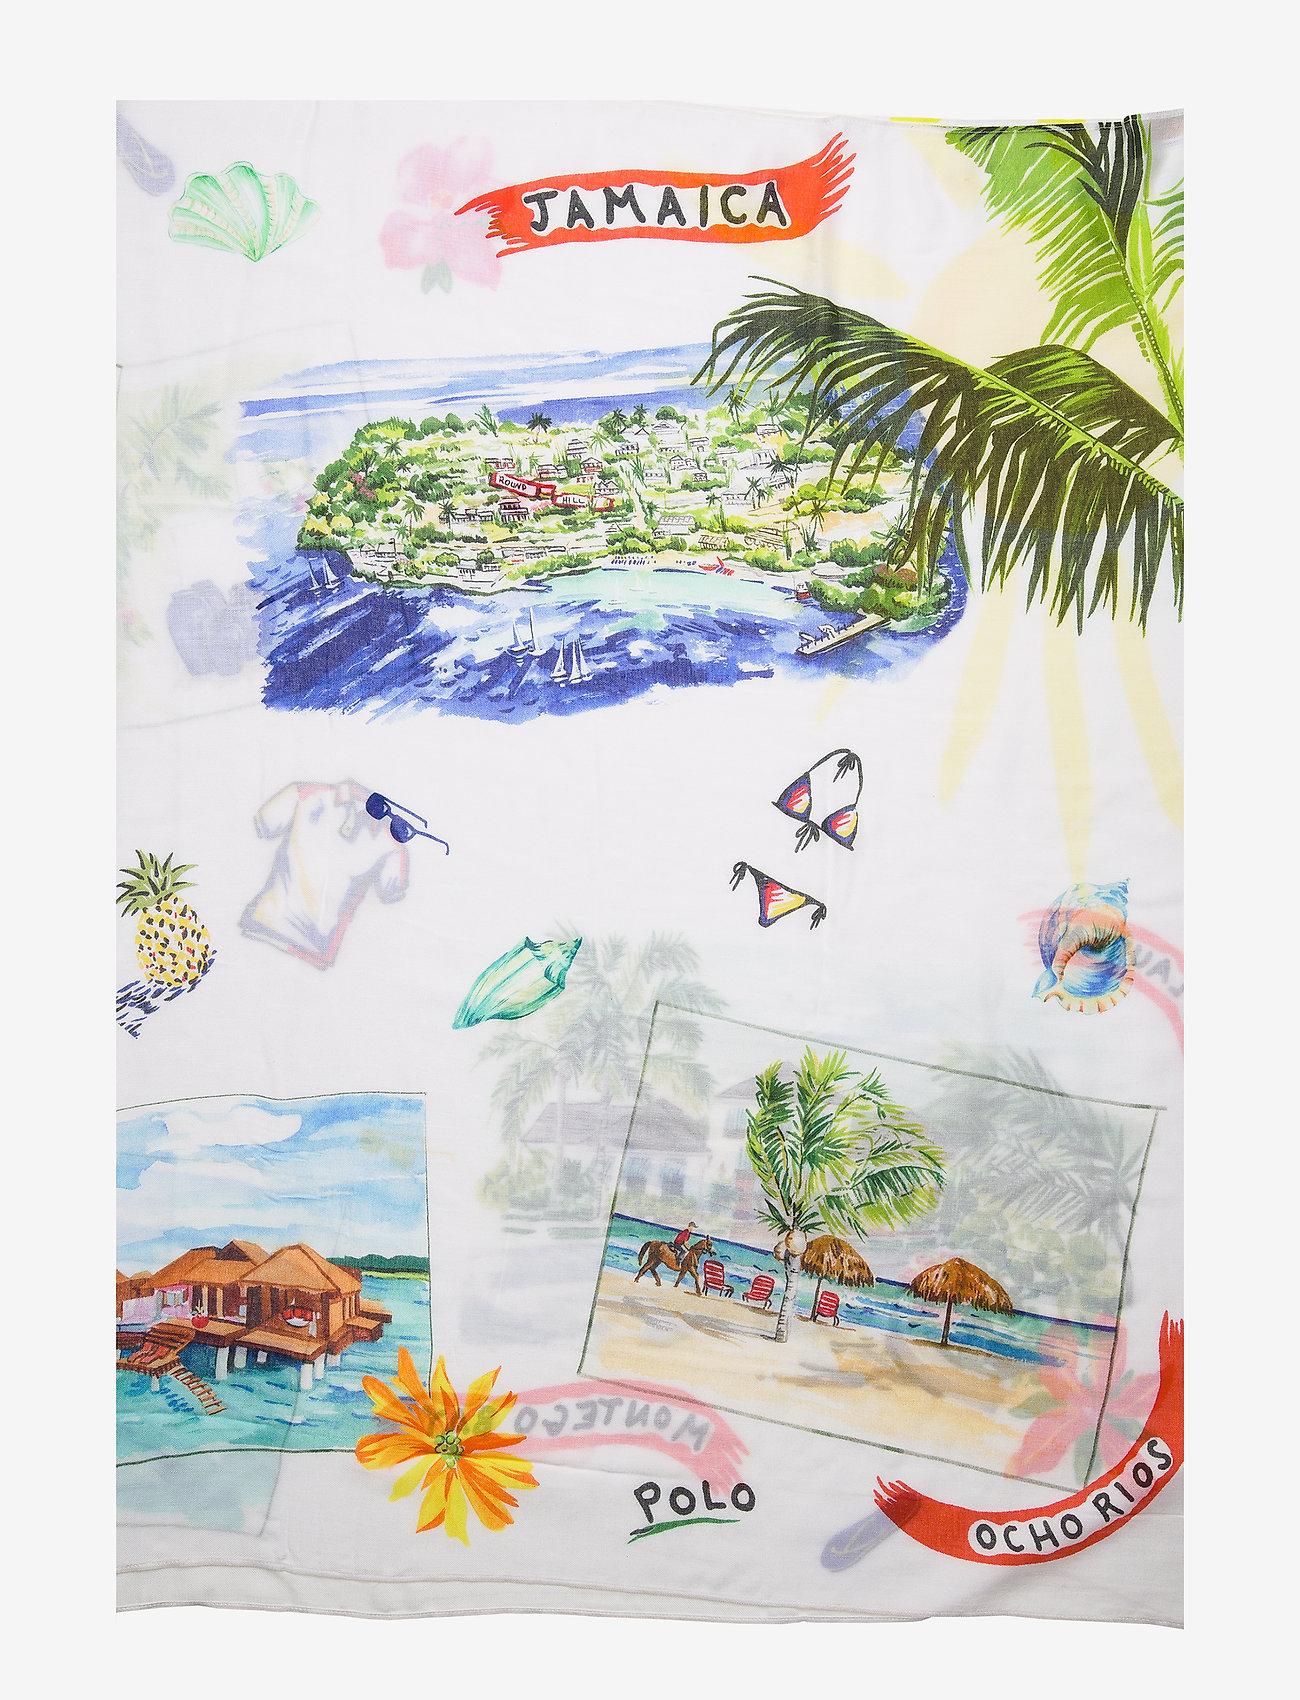 Polo Ralph Lauren  Jamaica-Print Wrap Scarf - Schals